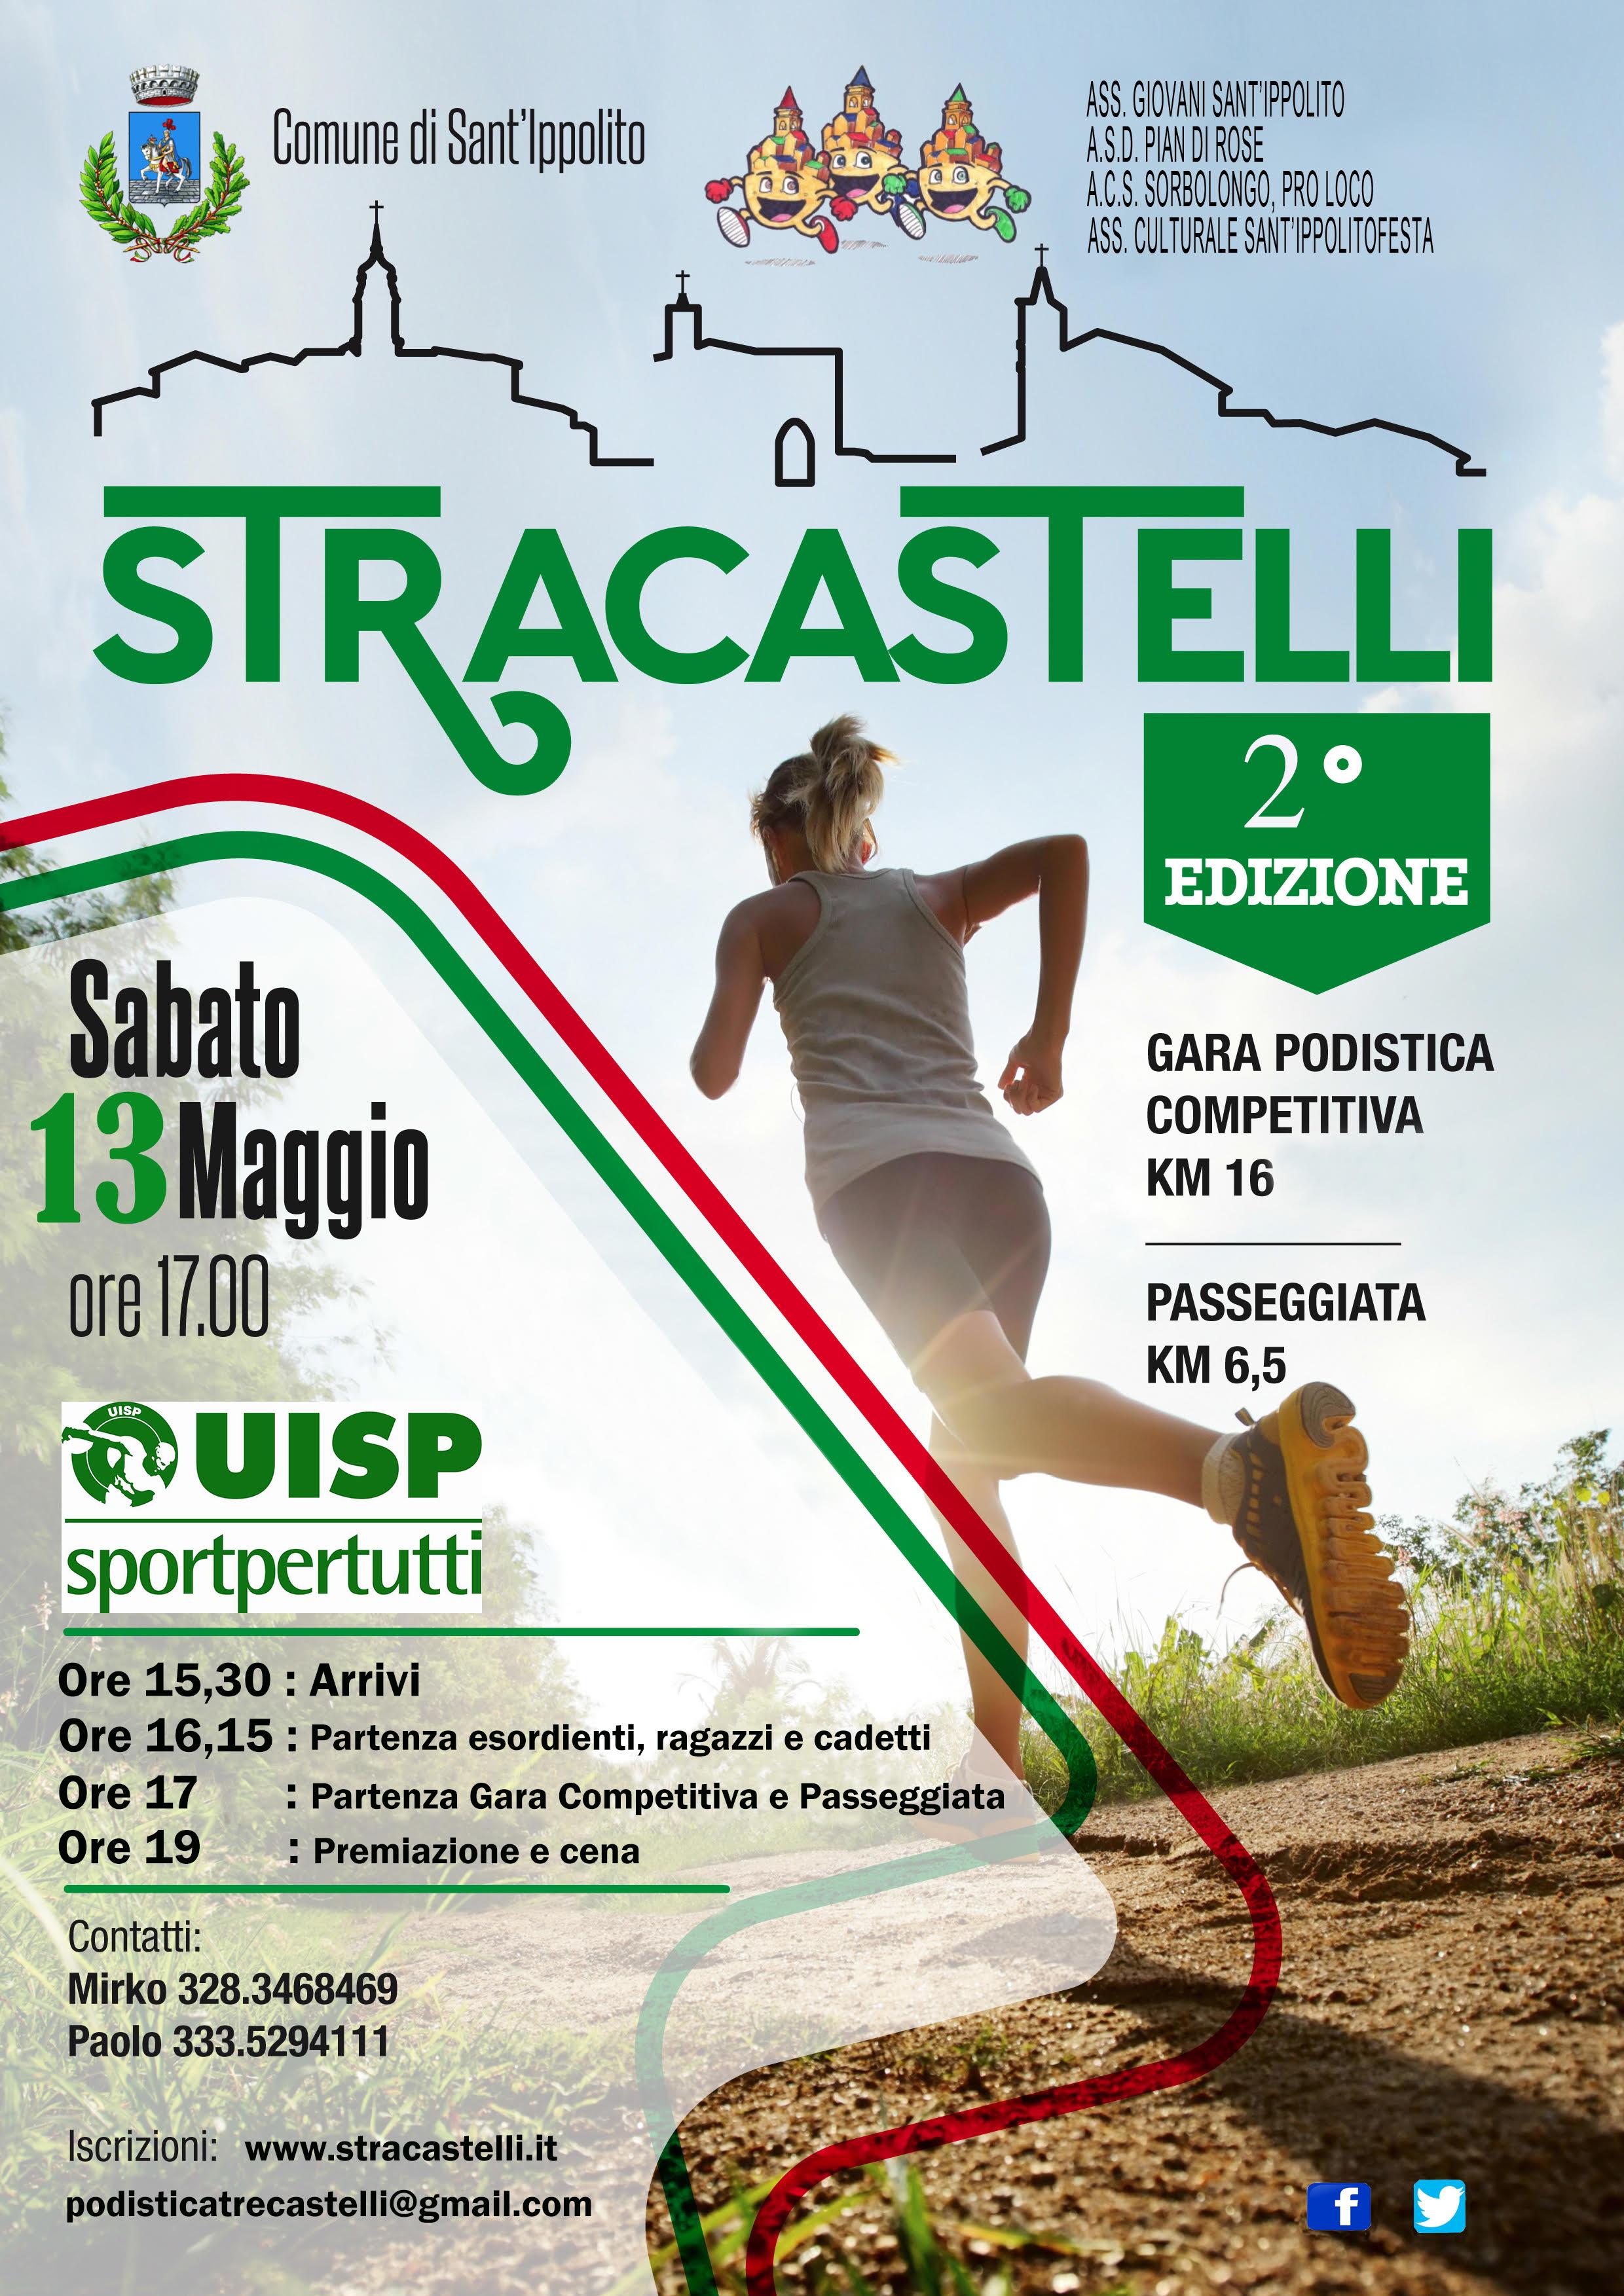 Stracastelli Sant'Ippolito 2017 - Gara podistica